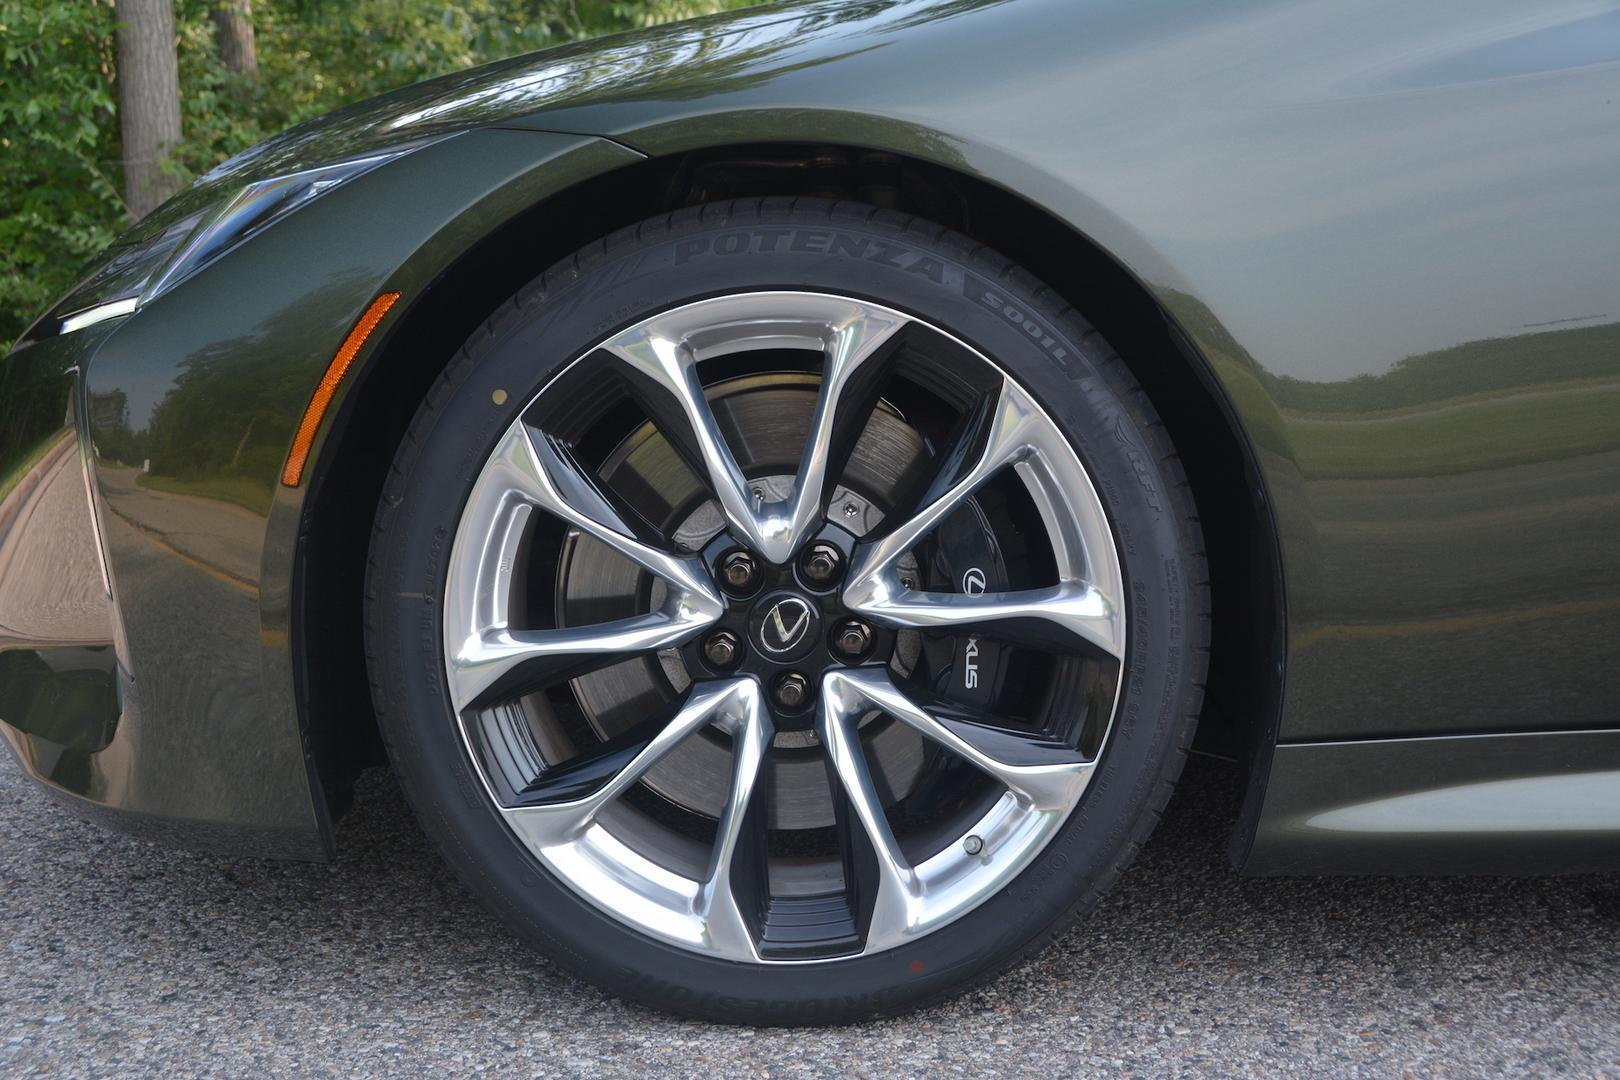 Lexus LC 500 Convertible wheels